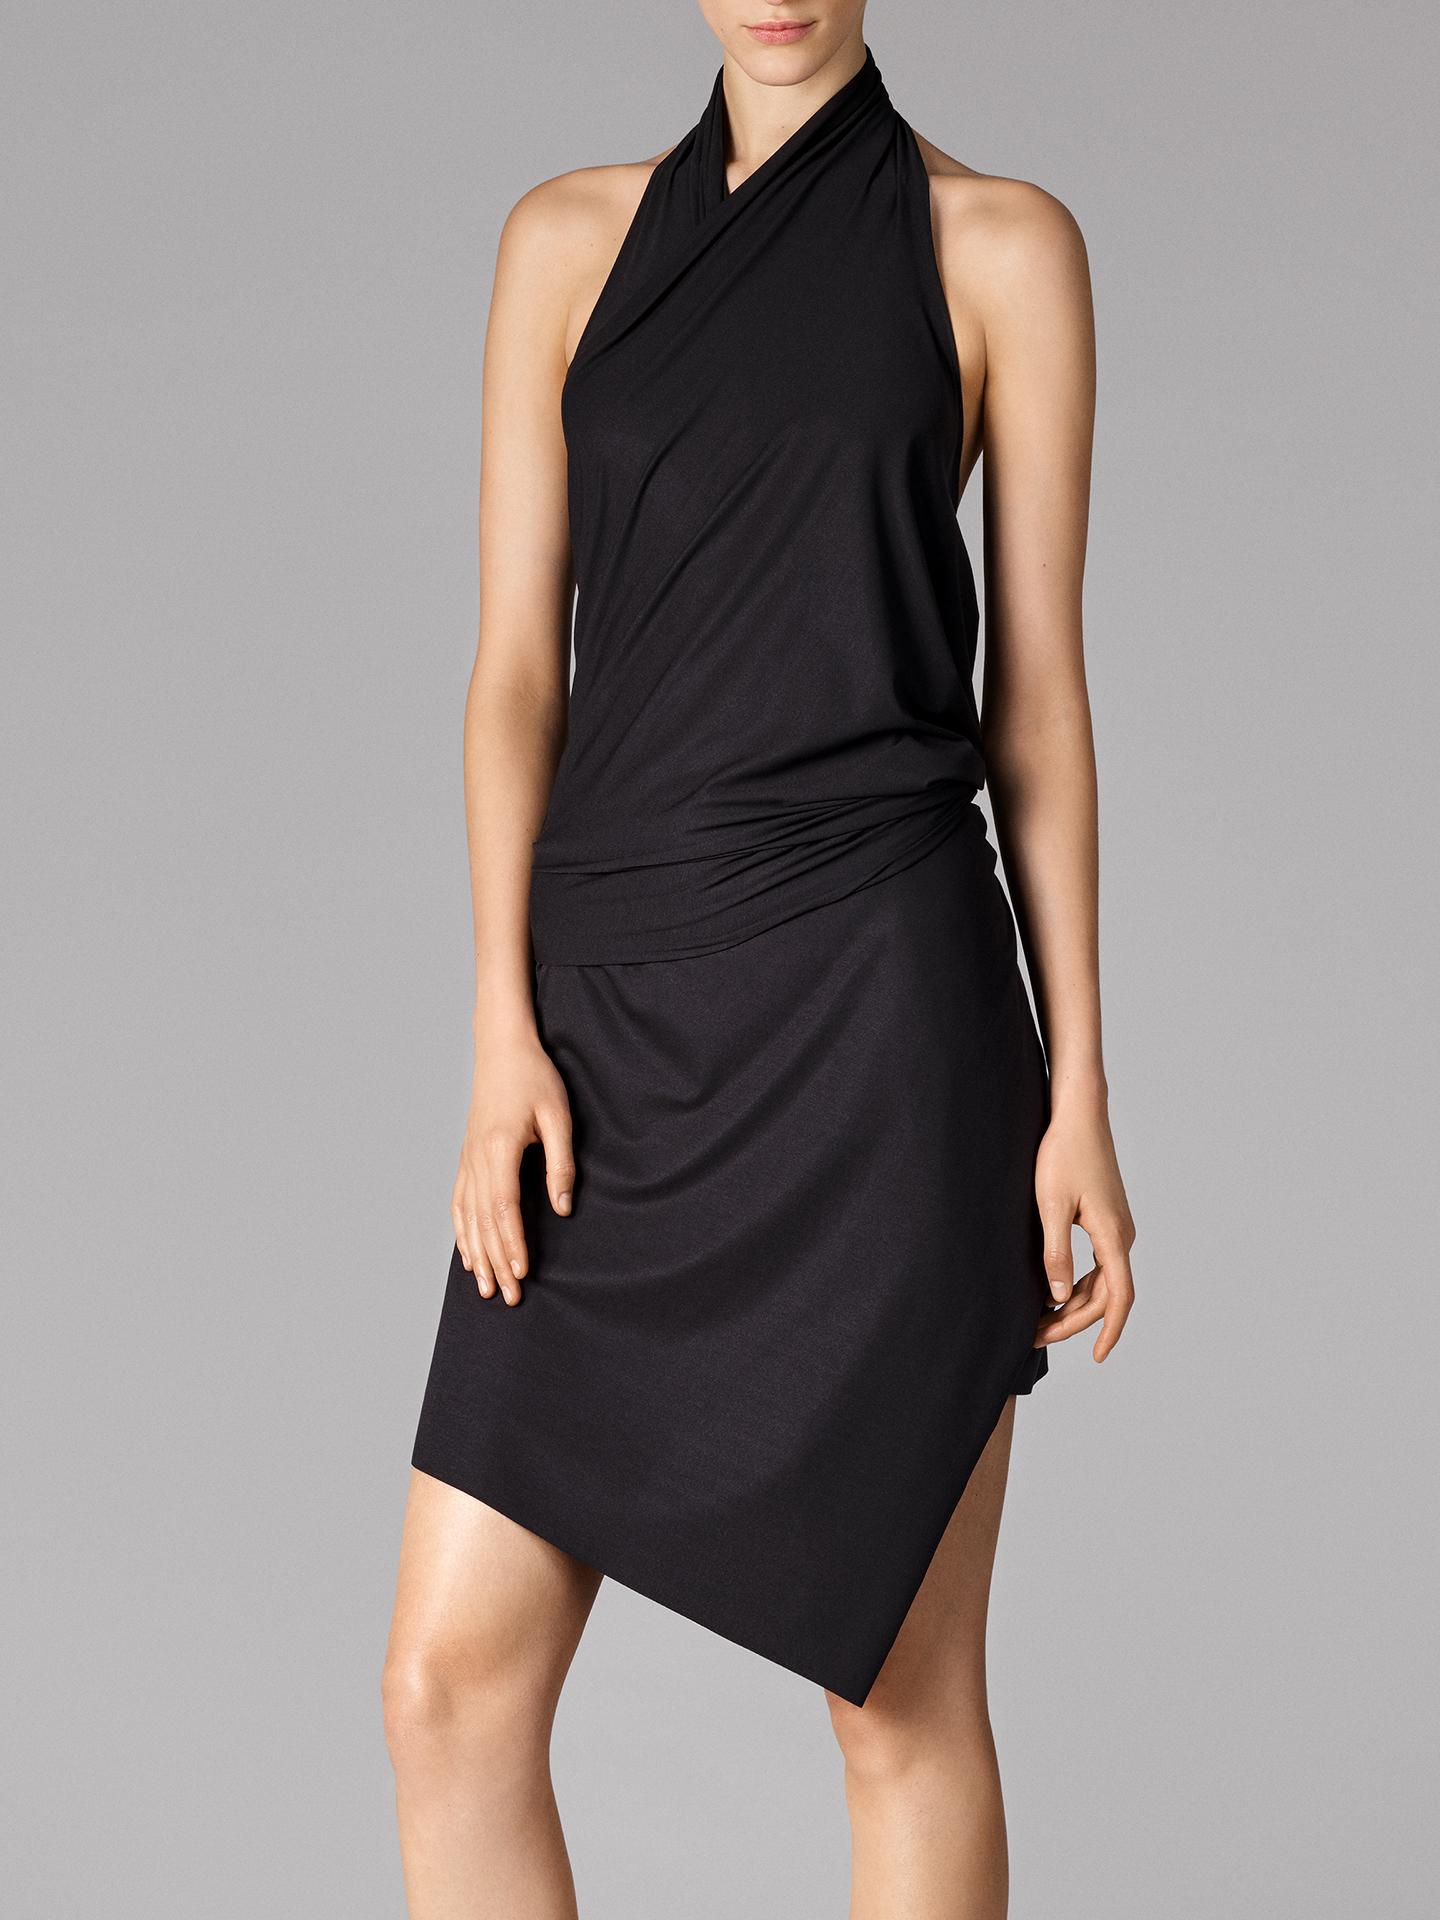 Pure Summer Dress - 7005 - M